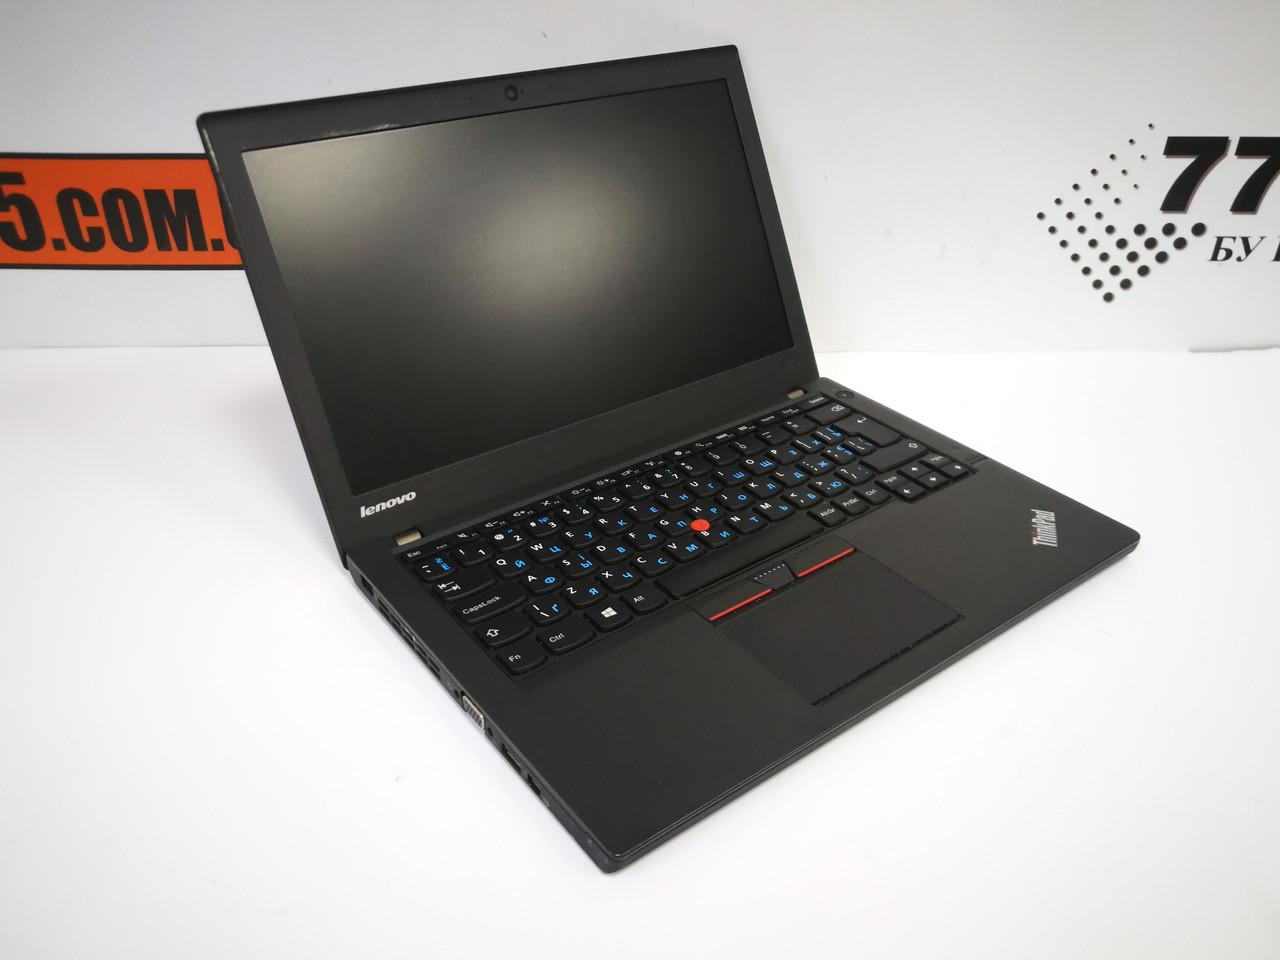 "Ноутбук Lenovo ThinkPad x250, 12.5"", Intel Core i7-5600U 3.2GHz, RAM 8ГБ, SSD 180ГБ"